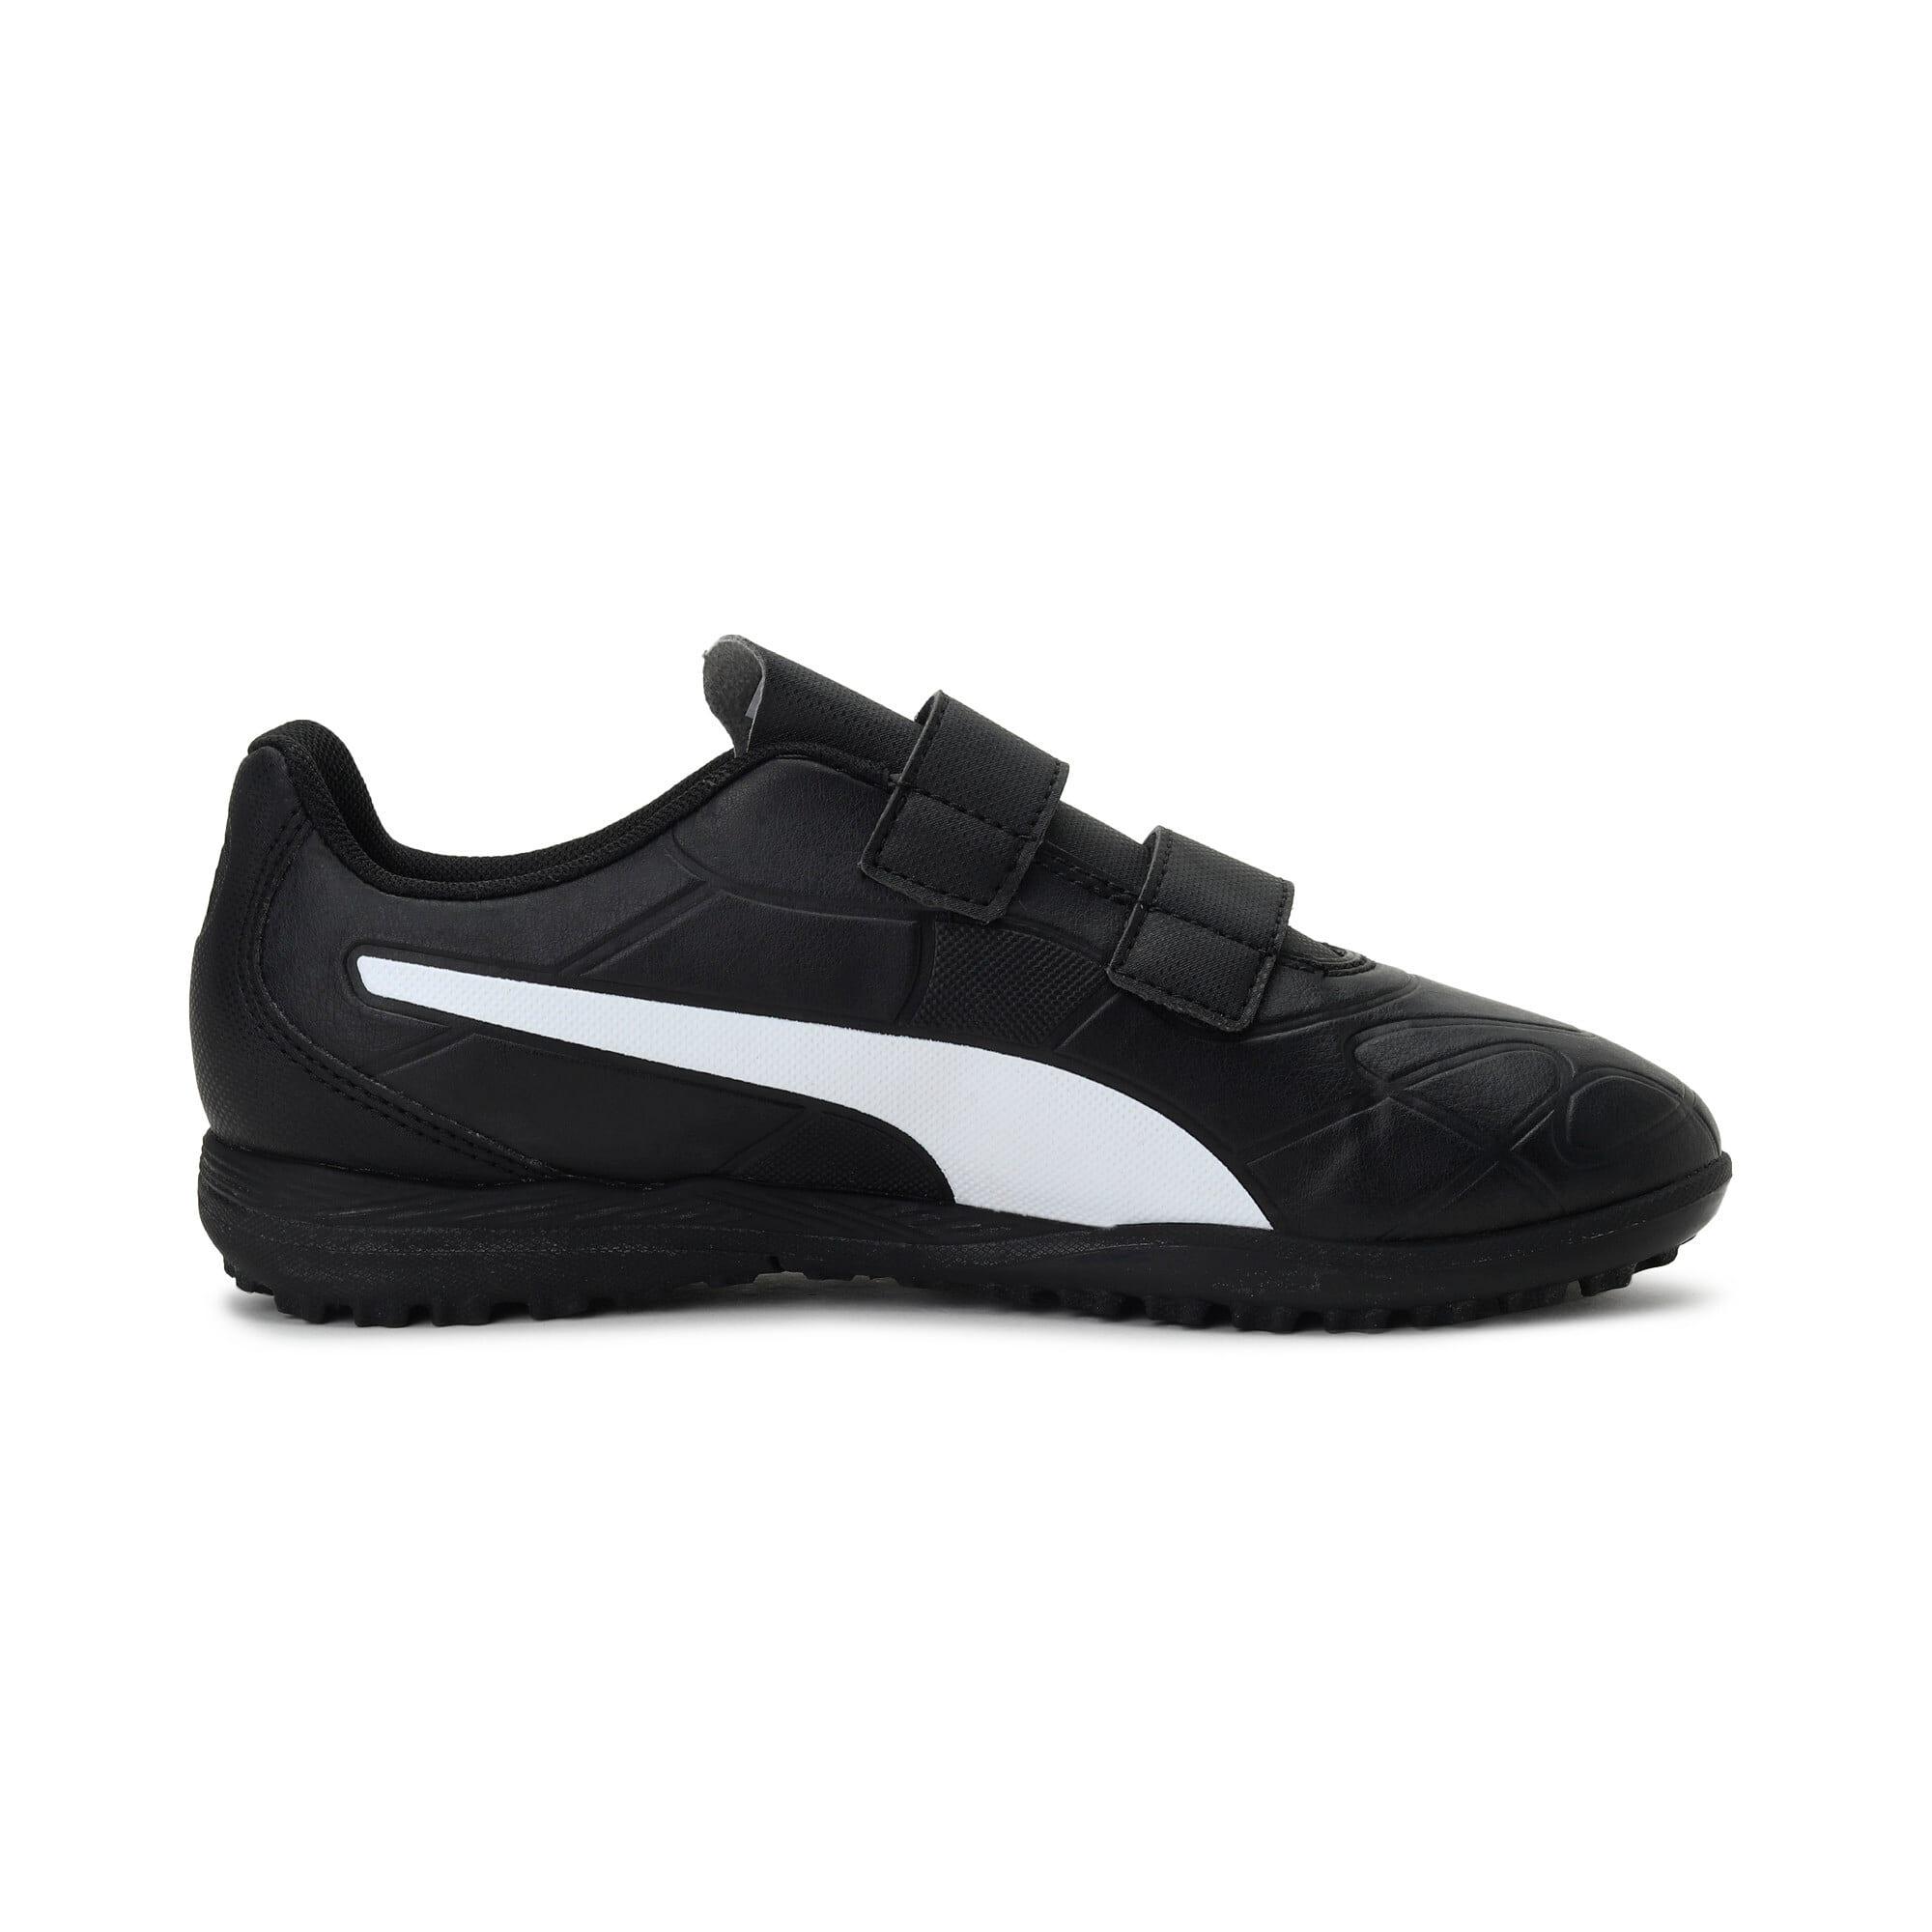 Thumbnail 5 of Monarch TT Youth Football Boots, Puma Black-Puma White, medium-IND